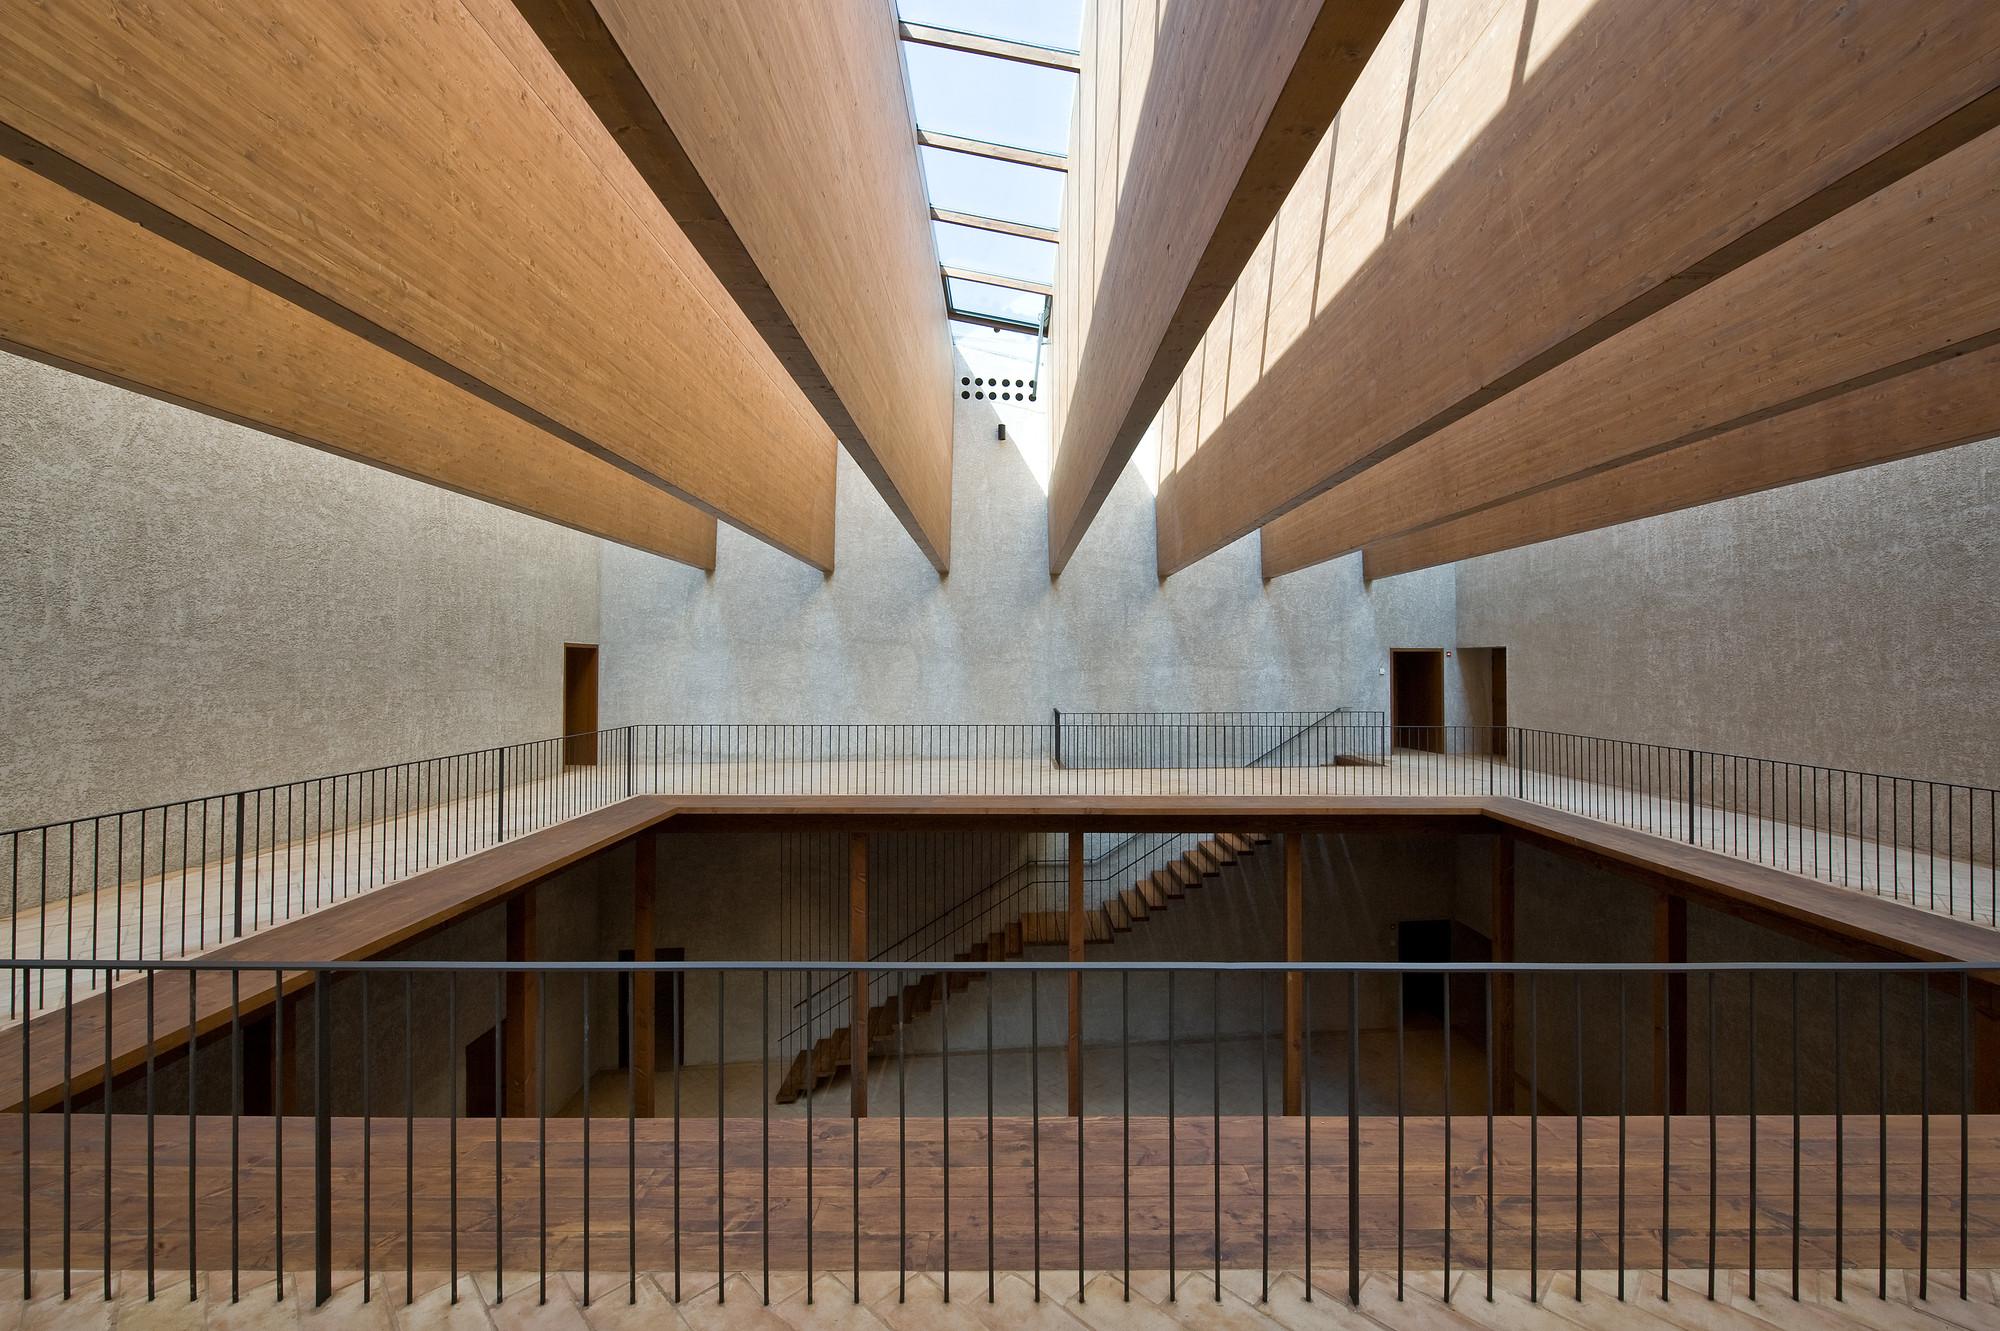 The Condestable's House / Tabuenca & Leache, Arquitectos, © Luis Prieto